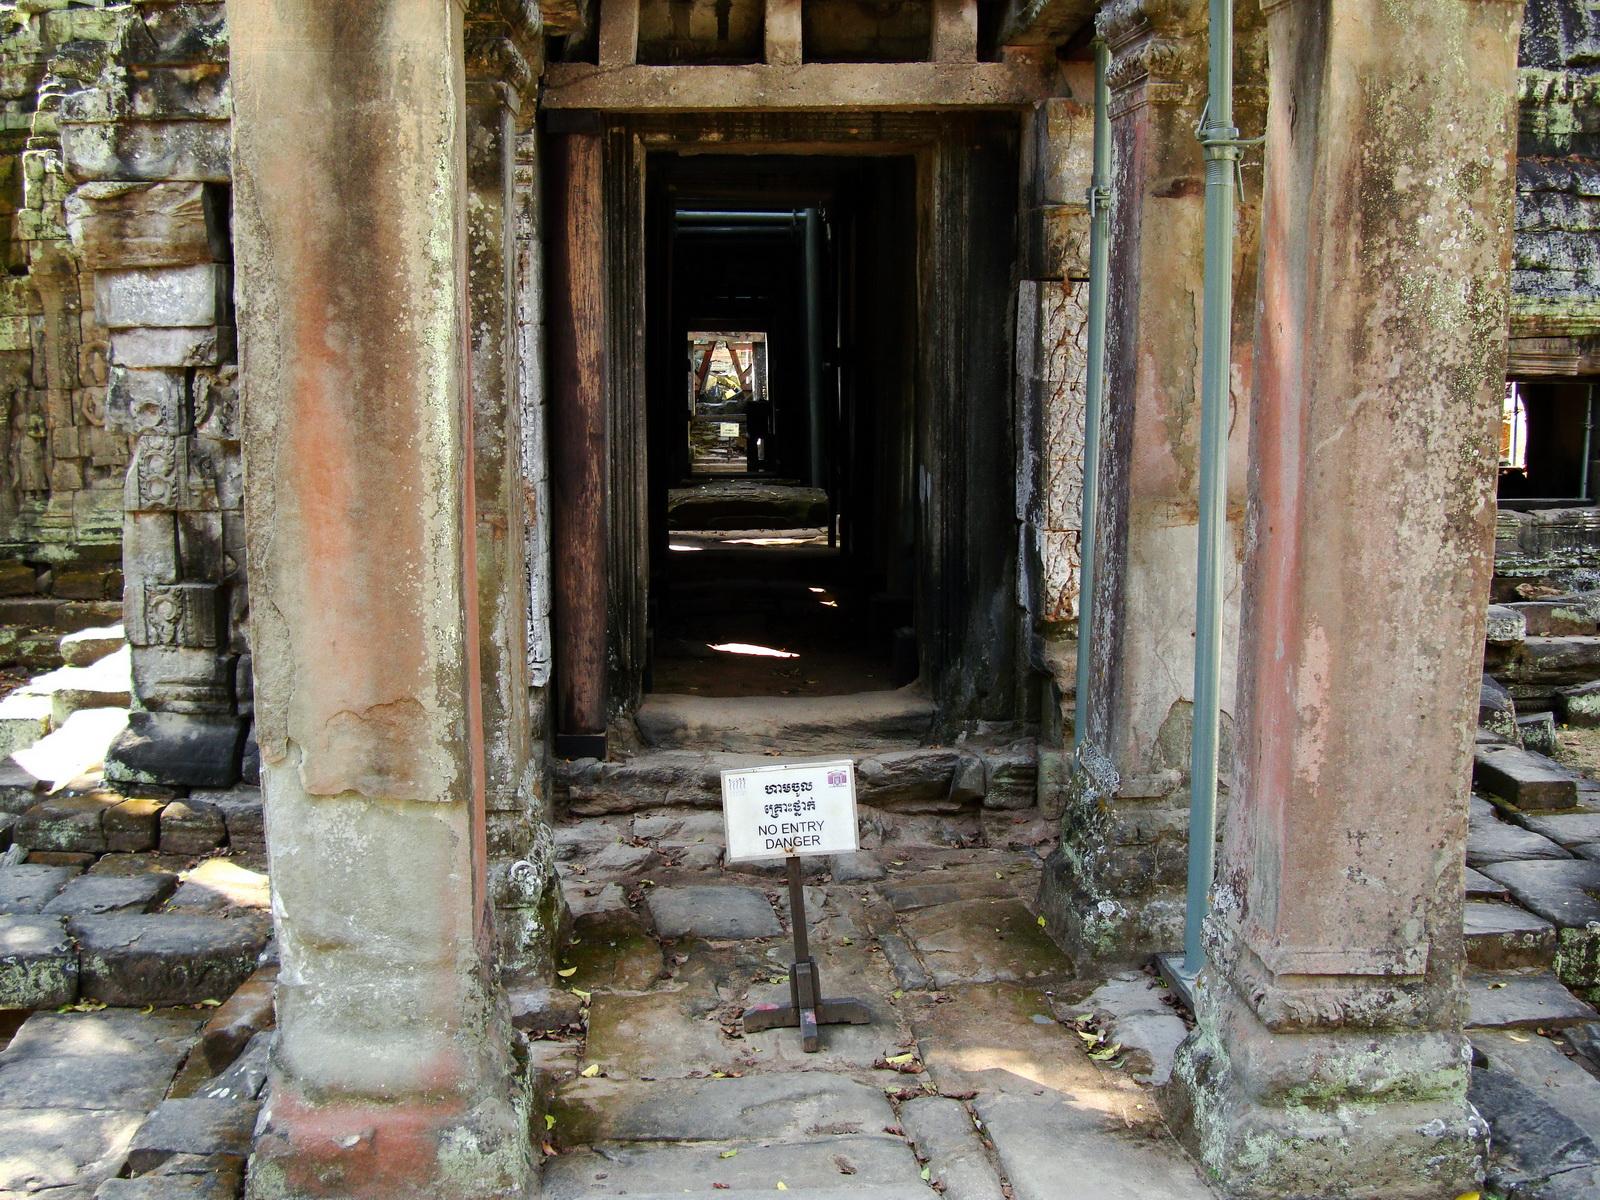 Ta Prohm Tomb Raider Bayon architecture Gopura 4 East entrance 04